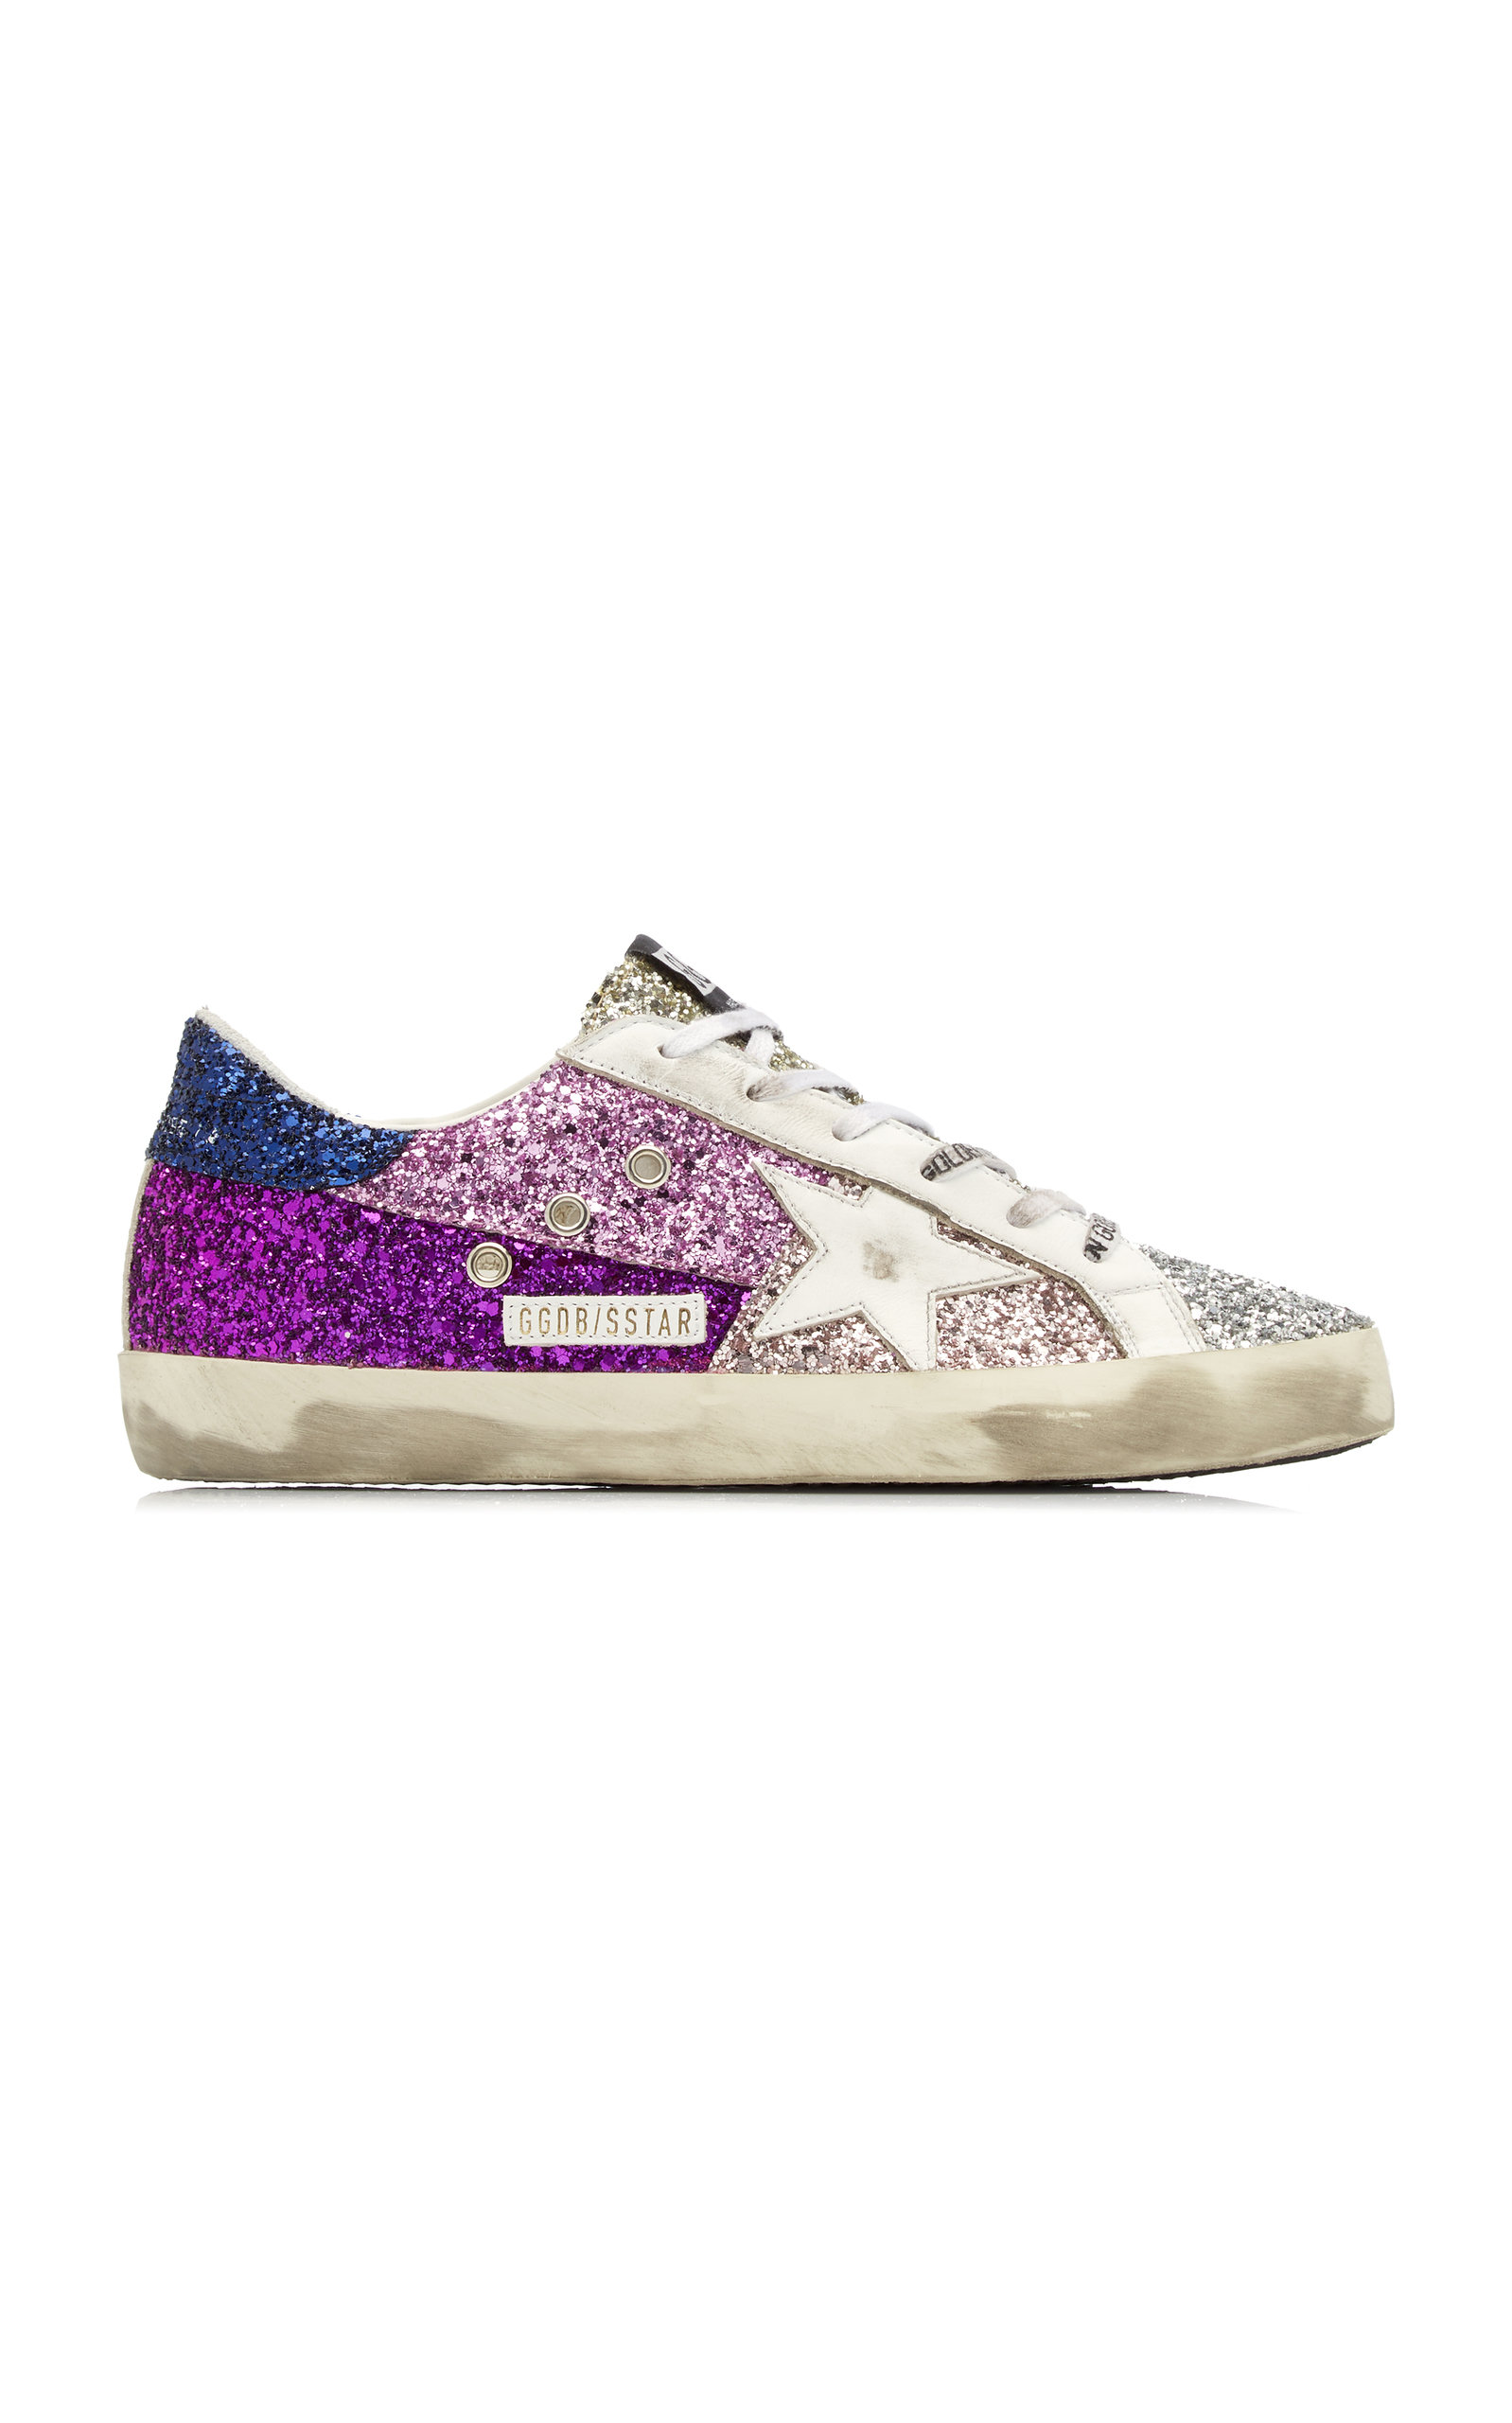 Golden Goose - Women's Super-Star Glittered Leather Sneakers - Purple - Moda Operandi